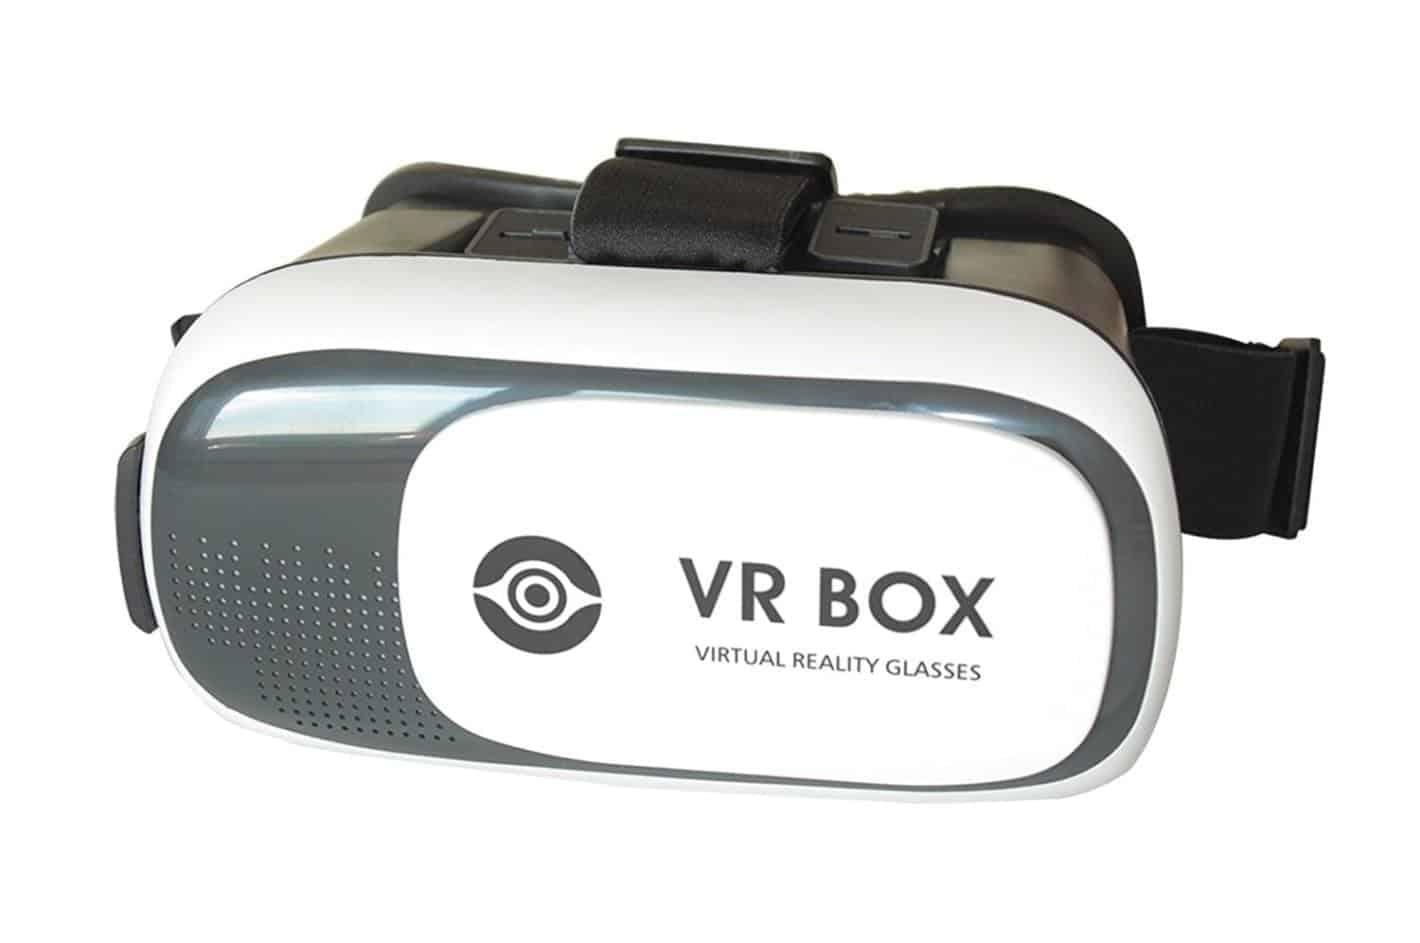 VR Box VR Headset